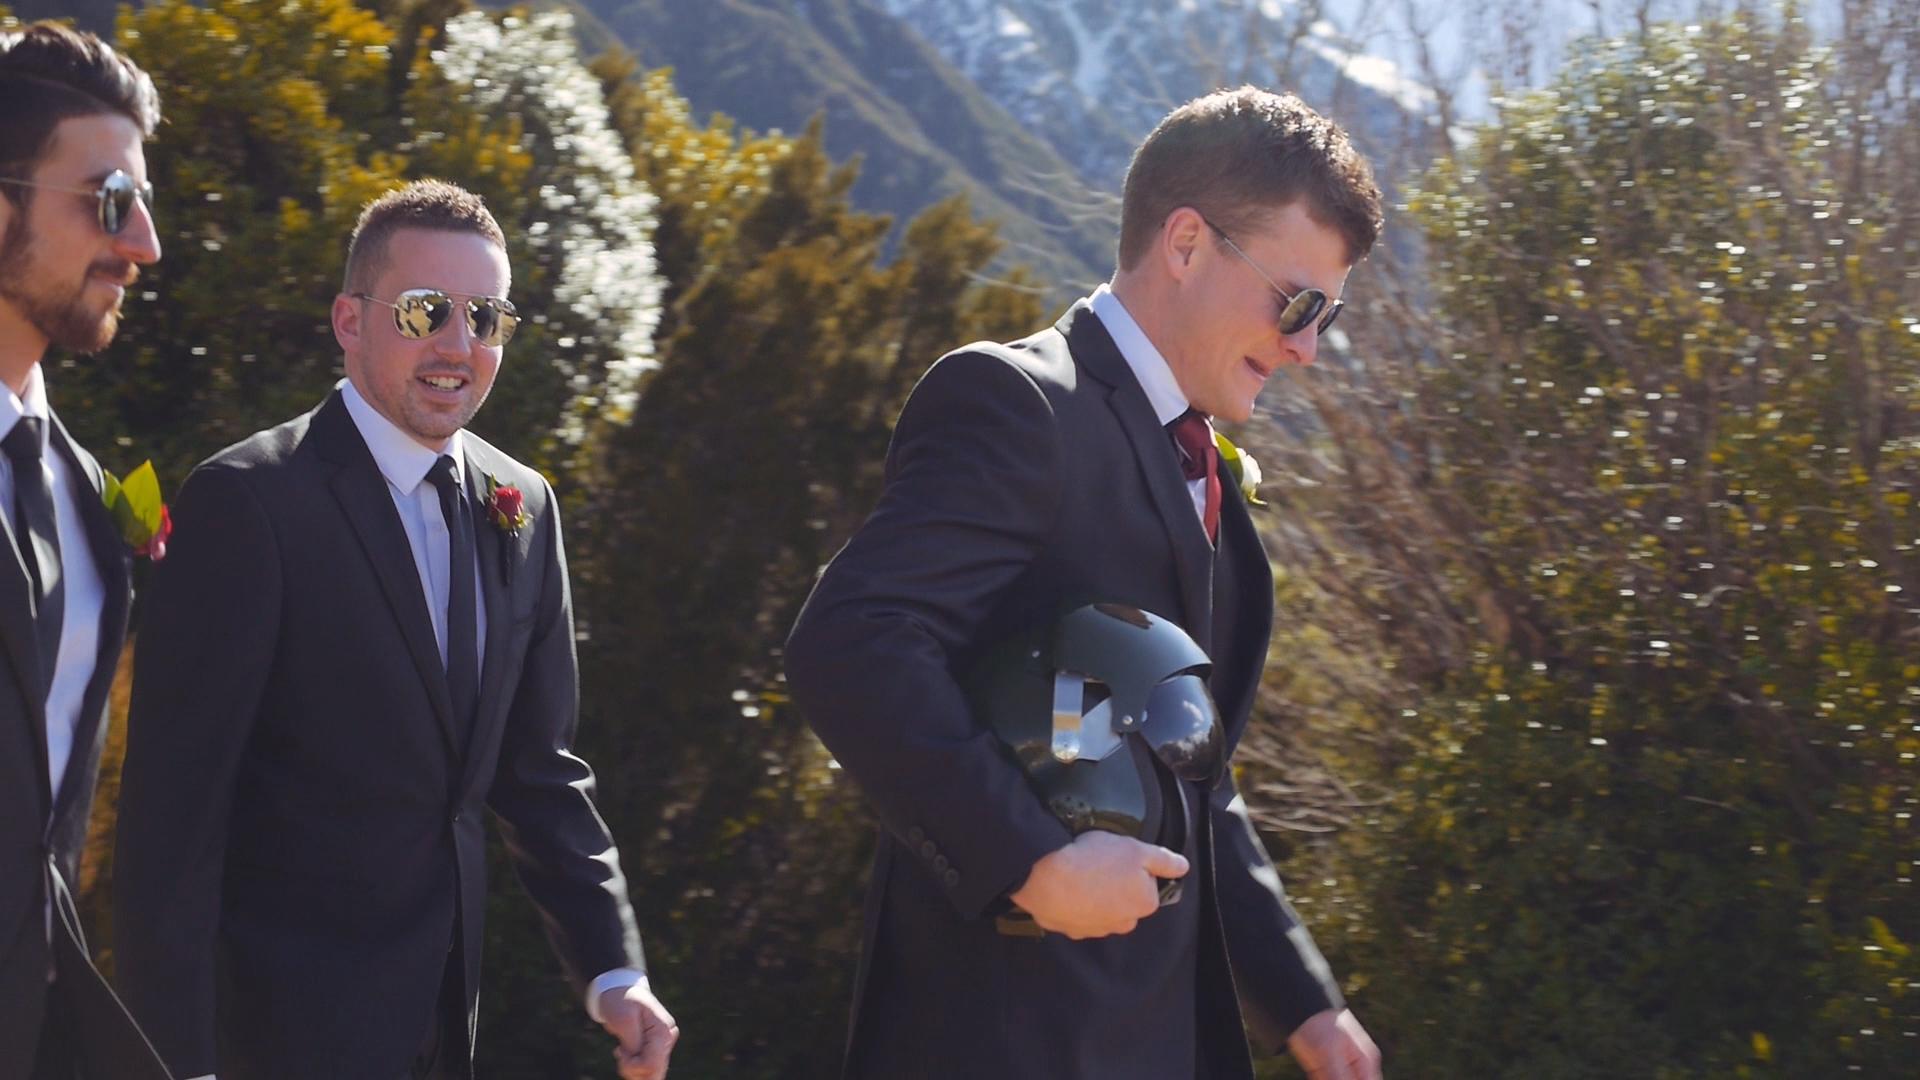 The Wedding Film07.jpg